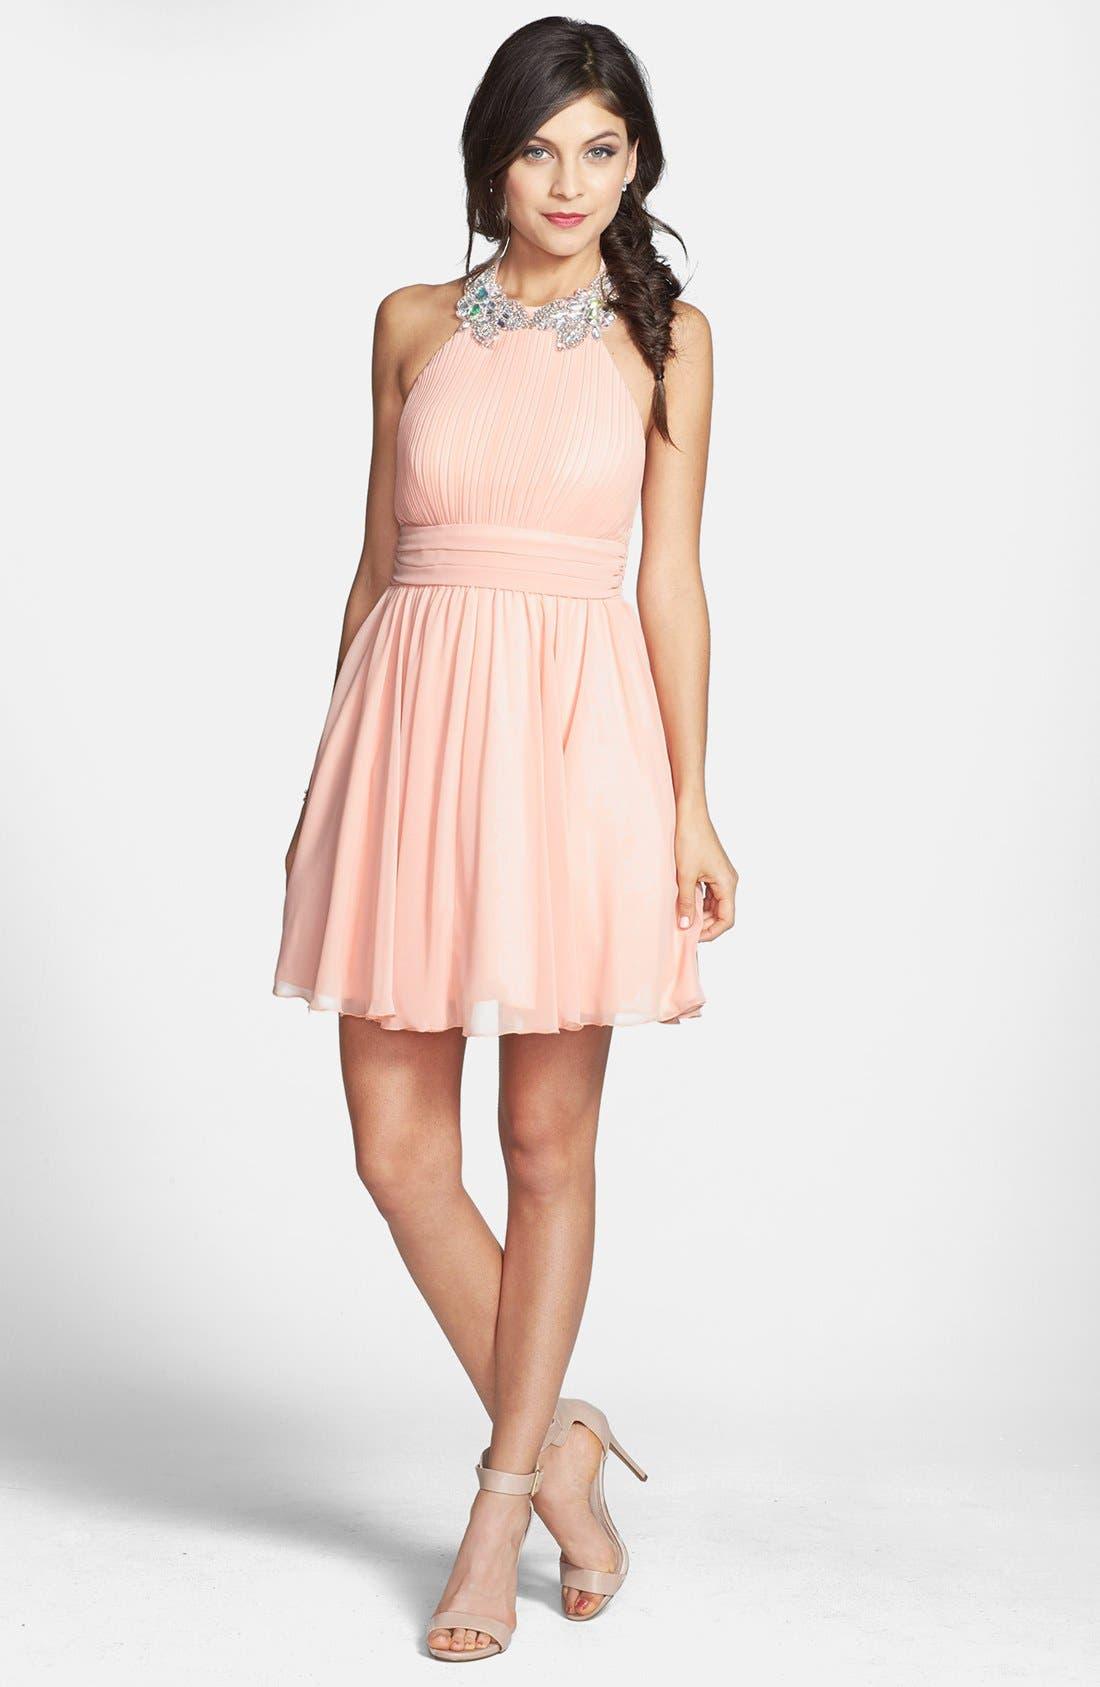 Alternate Image 1 Selected - Way-In Embellished Neck Chiffon Halter Dress (Juniors) (Online Only)